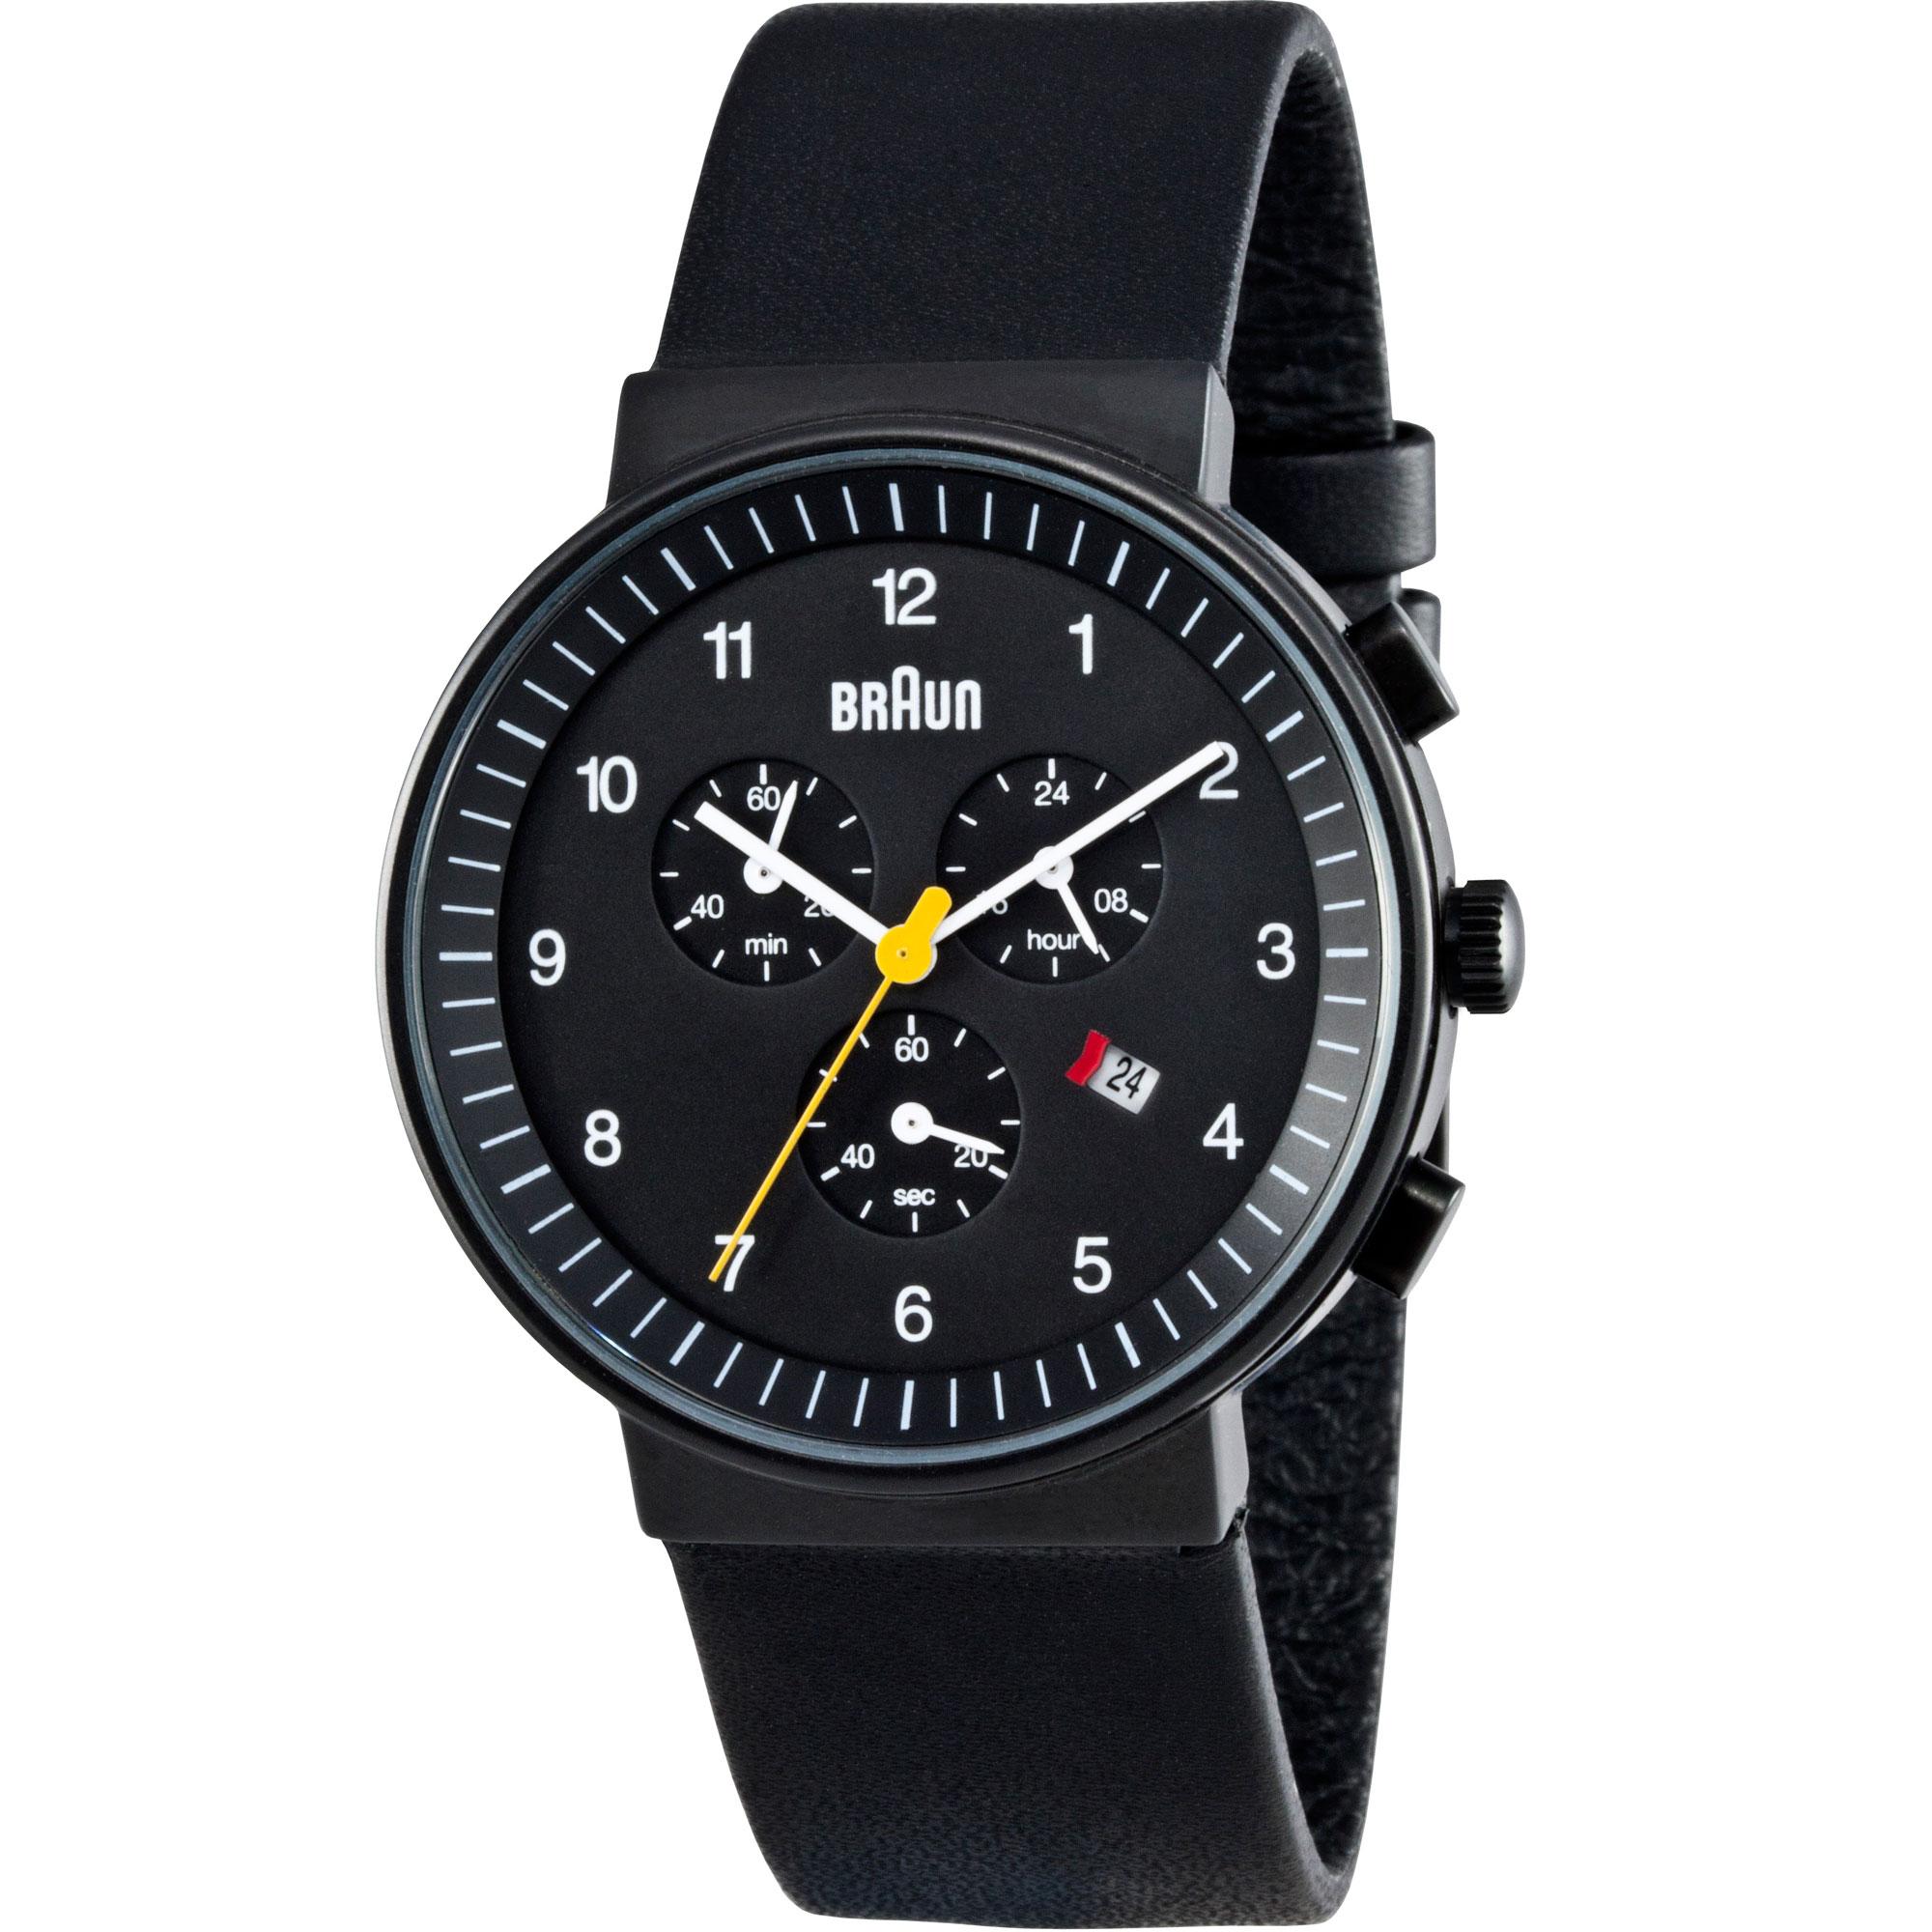 7e73bae67c70c Gents Braun BN0035 Classic Chronograph Watch (BN0035BKBKG ...